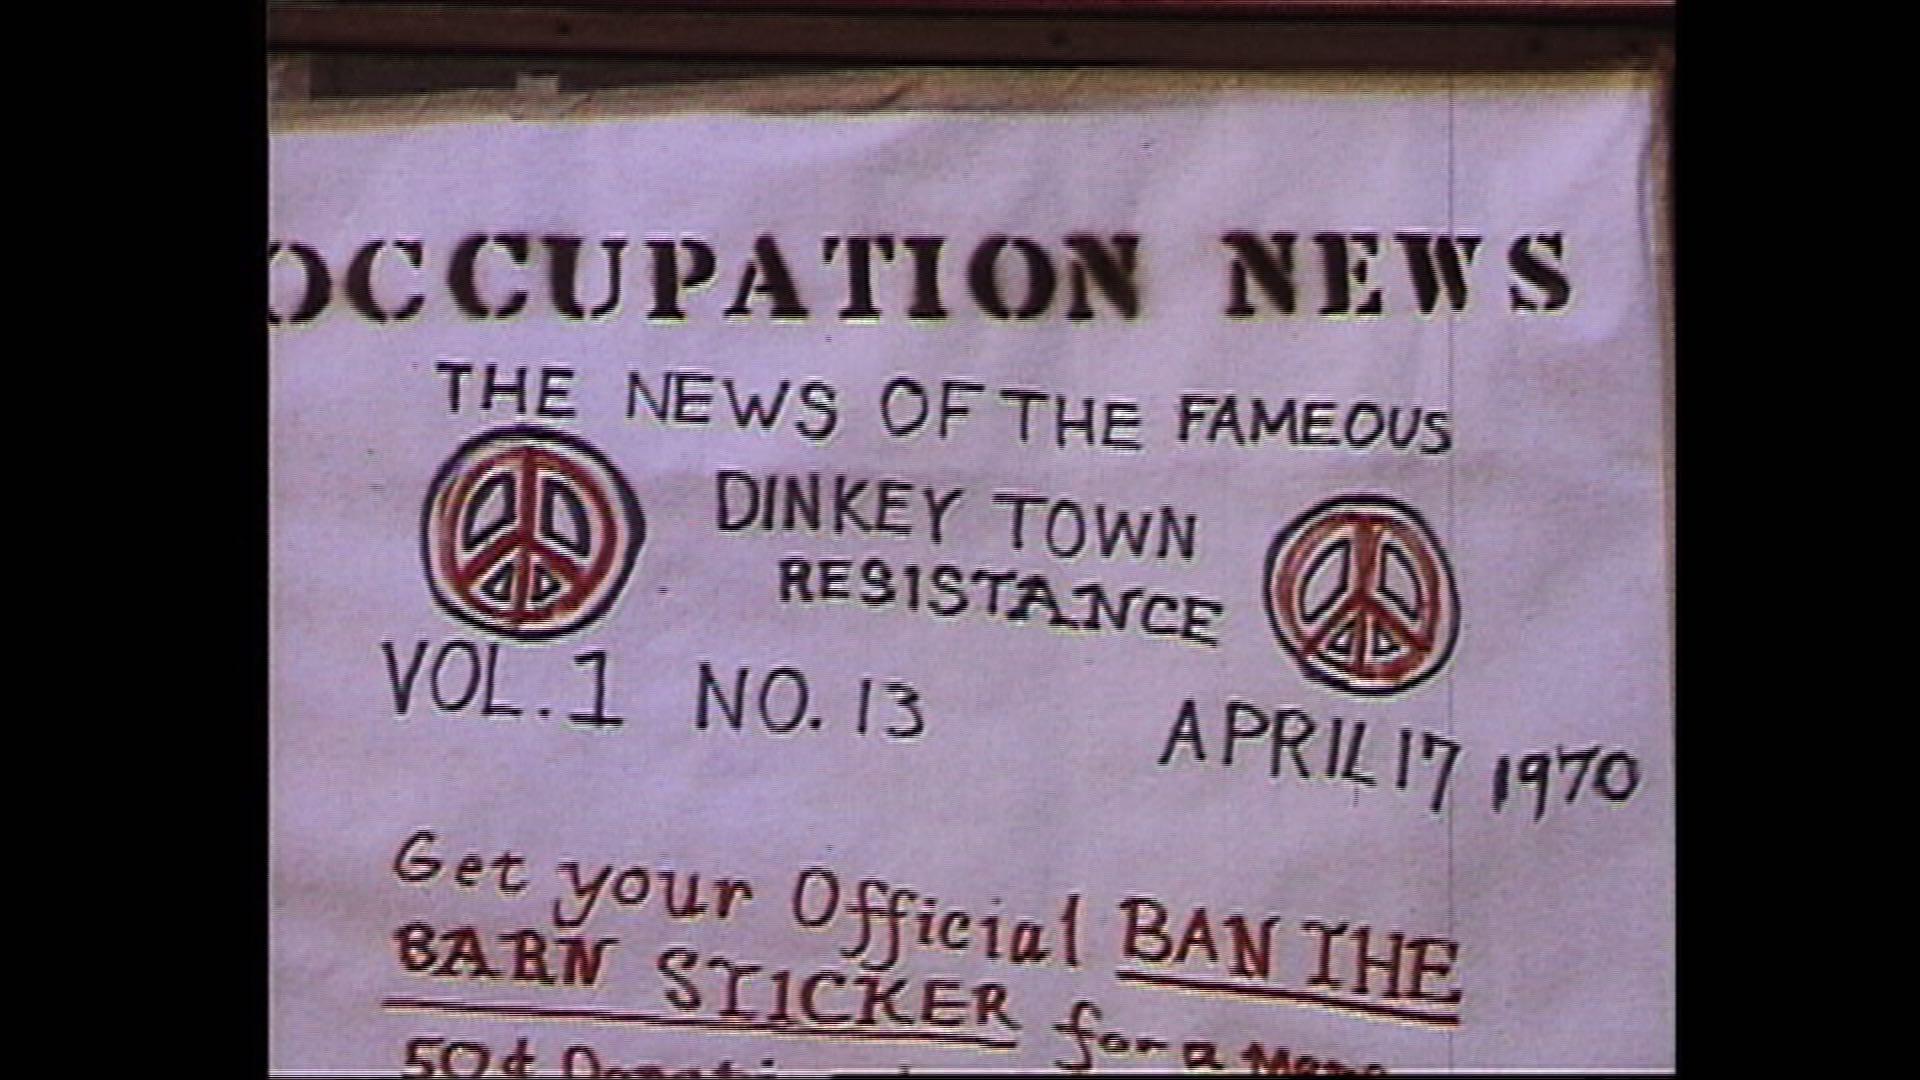 Red Barn - Occupation News.jpg